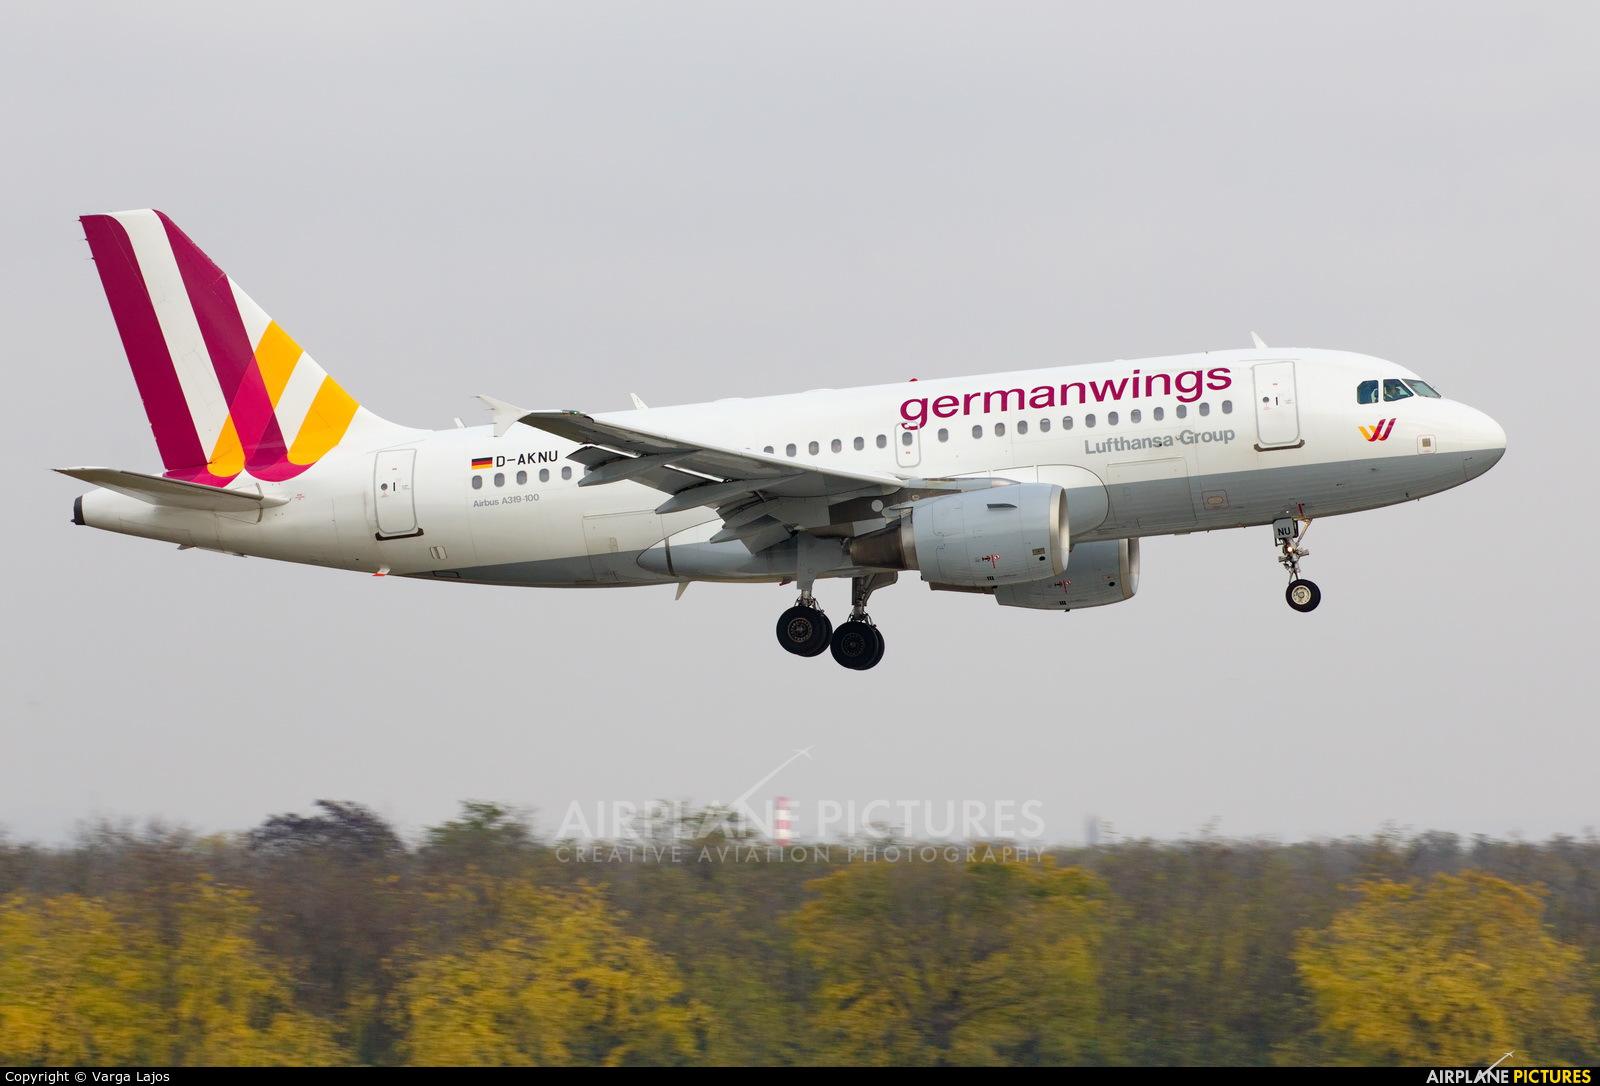 Germanwings D-AKNU aircraft at Budapest Ferenc Liszt International Airport